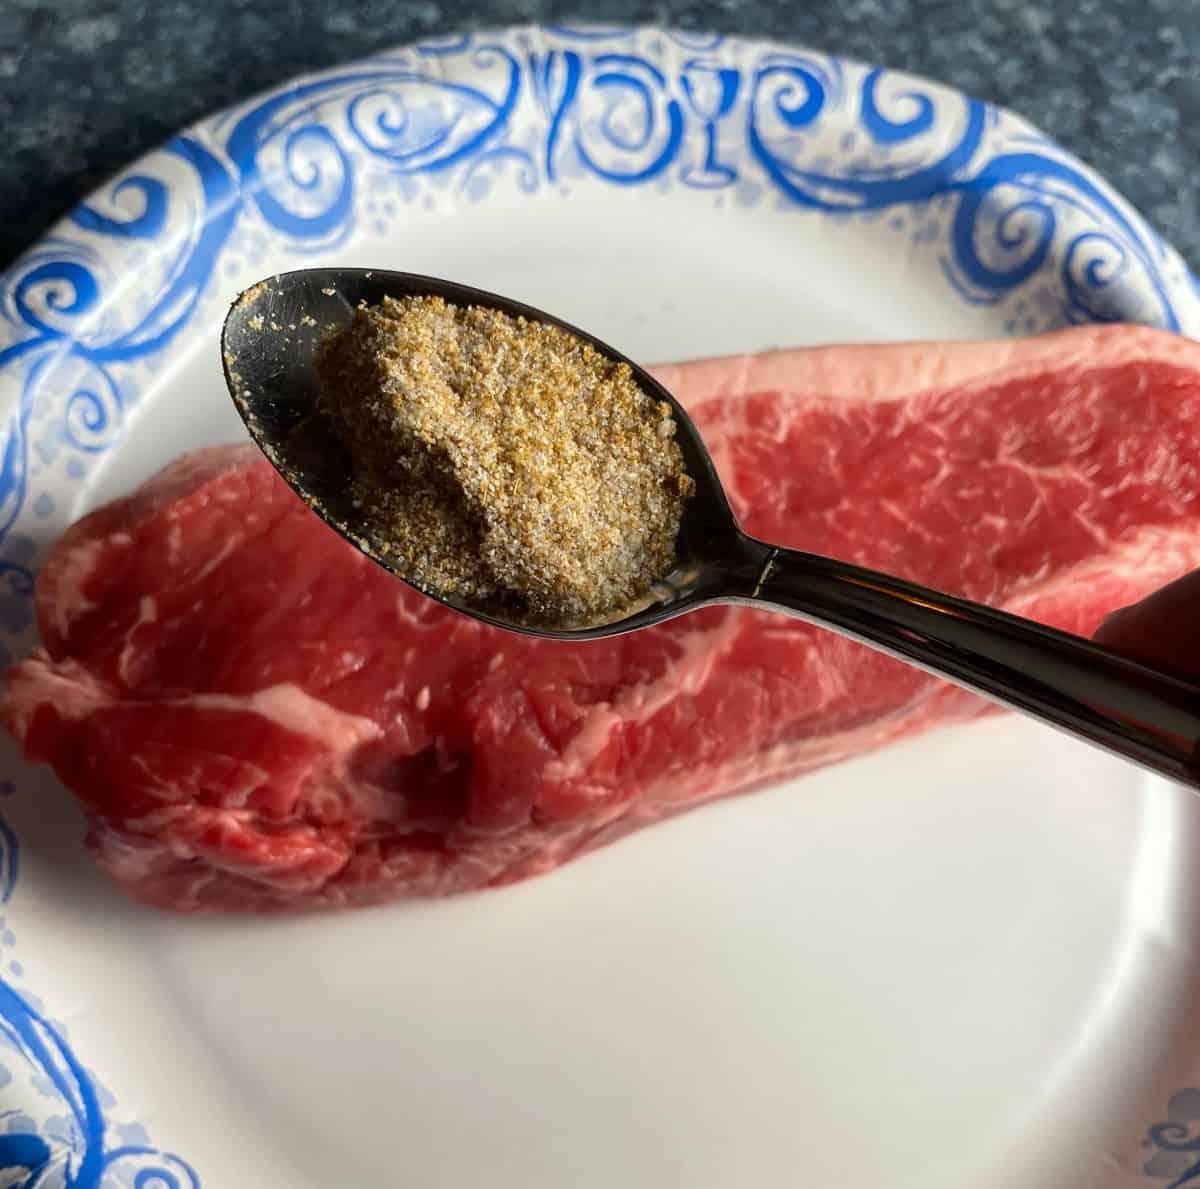 teaspoon of dry steak rub over a piece of raw steak.